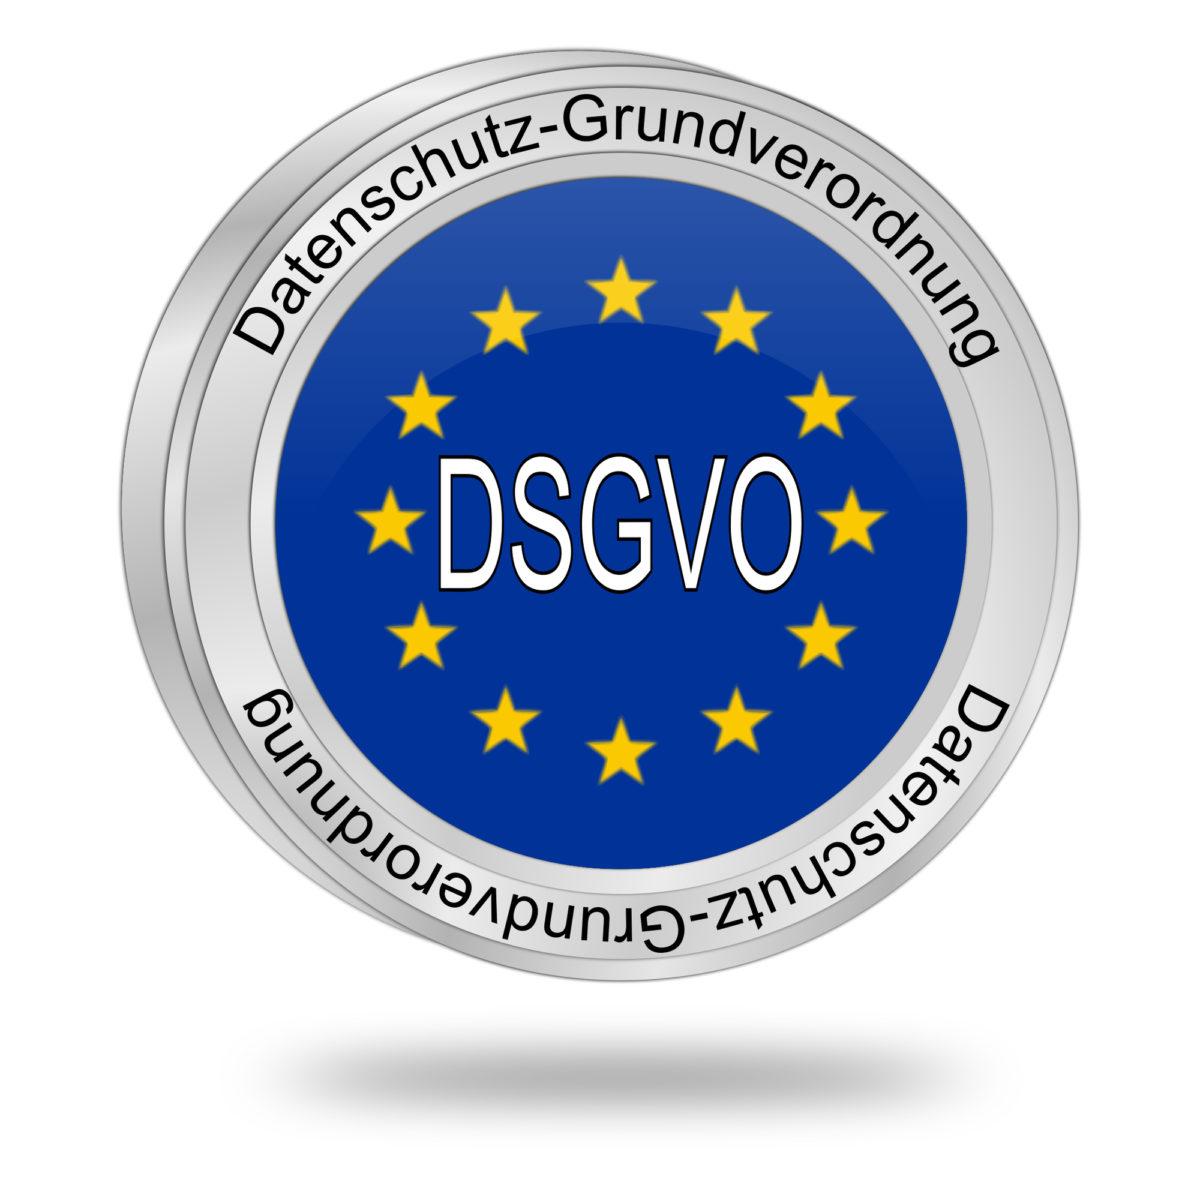 DSGVO Emblem Datenschutzgesetz 2018